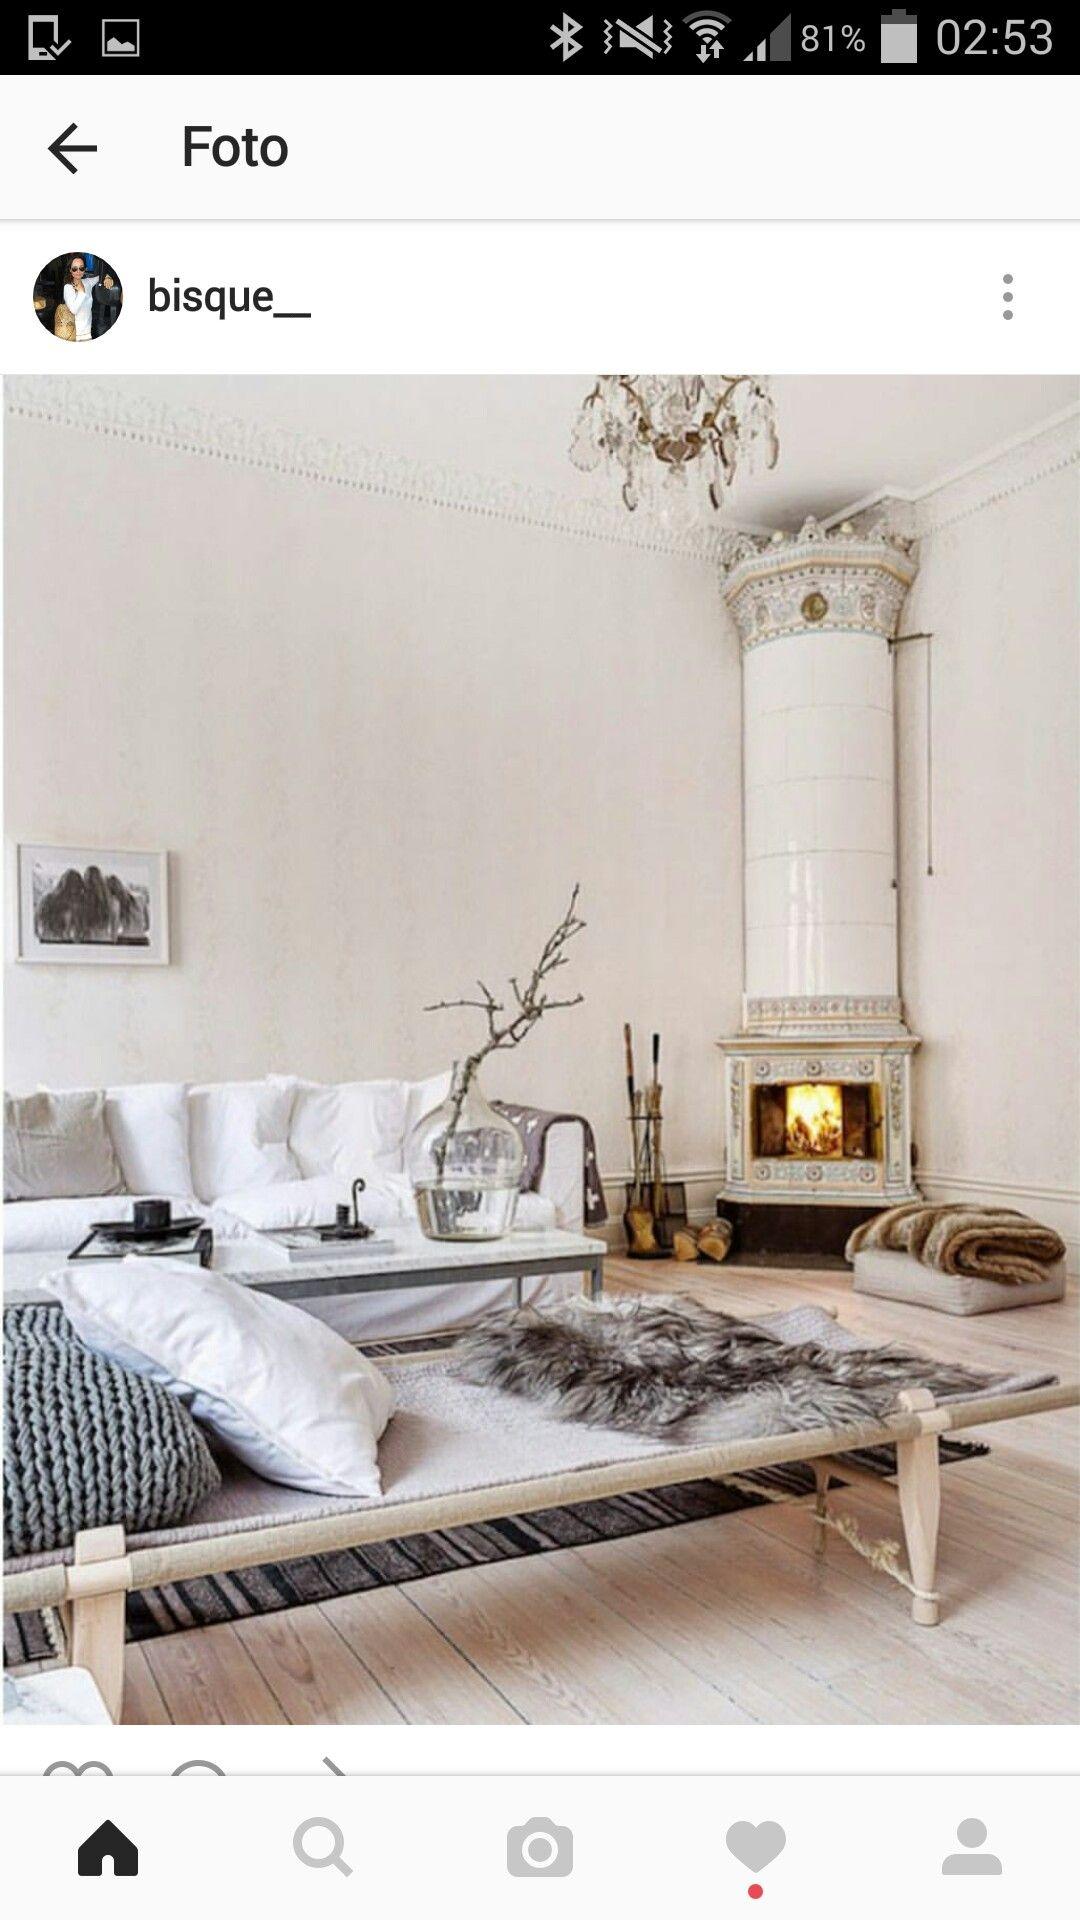 Pin By Ana De La Serna On For The Home Interior Home